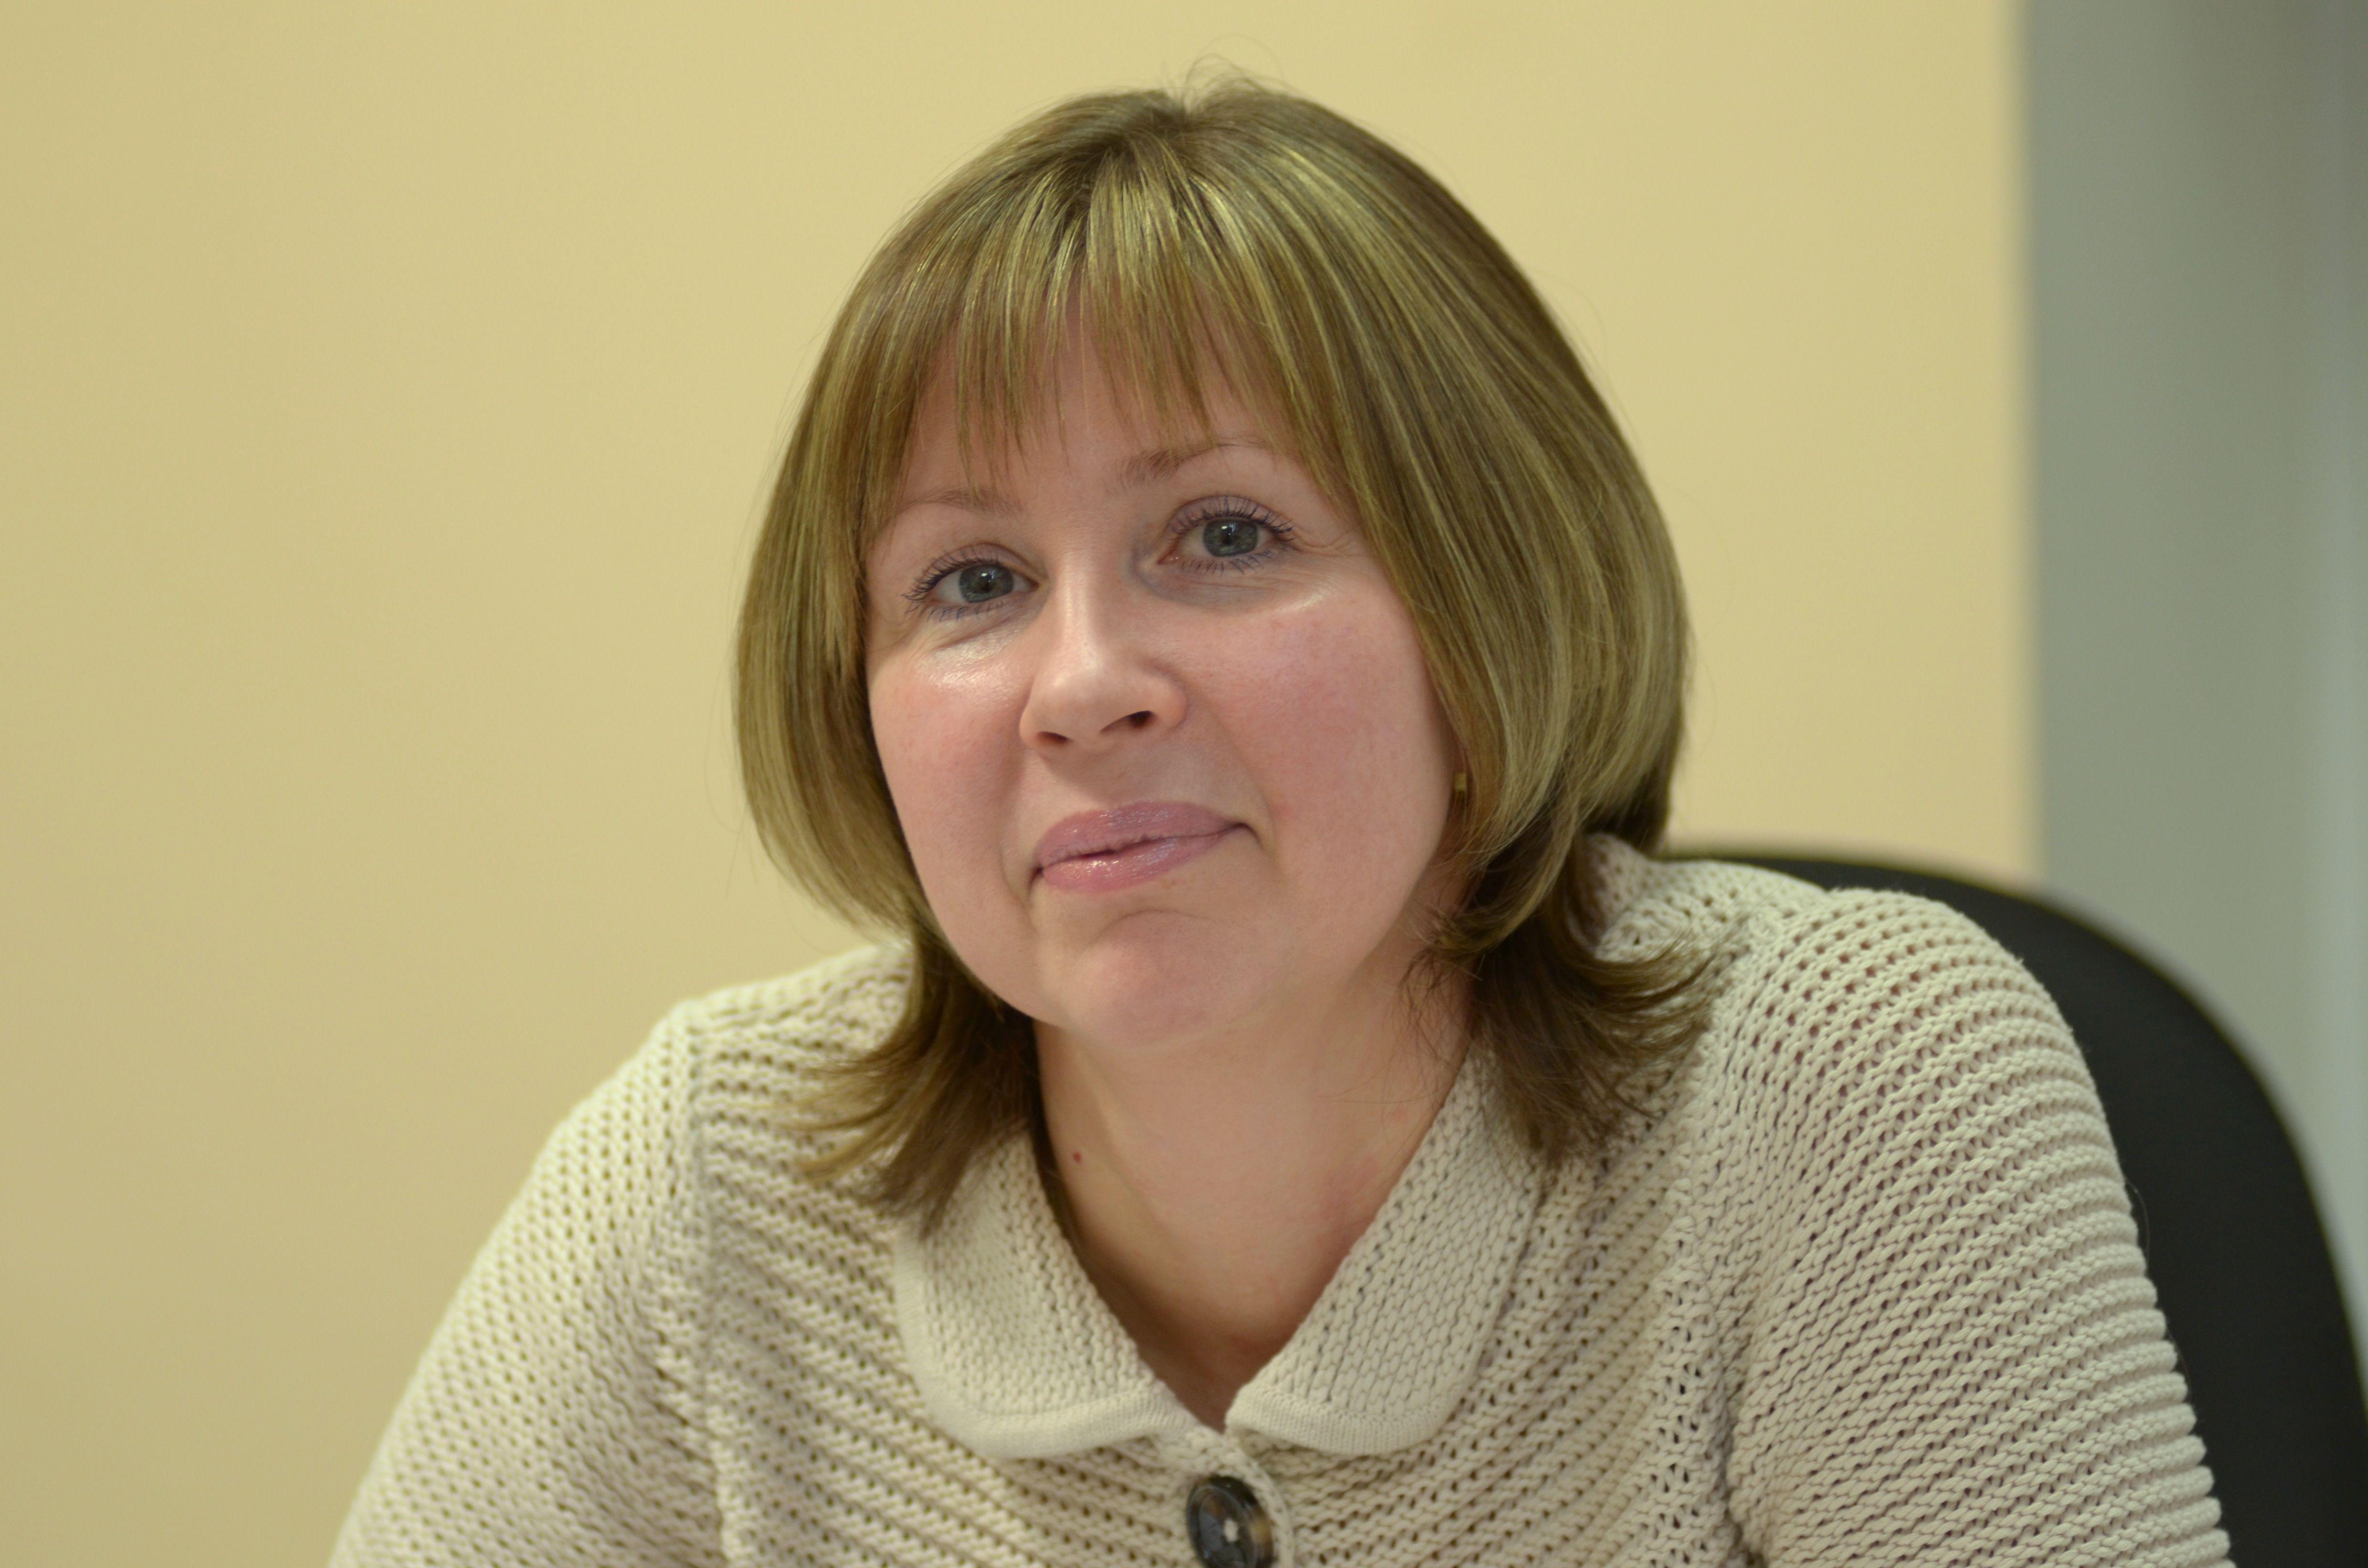 Maria Bomasch